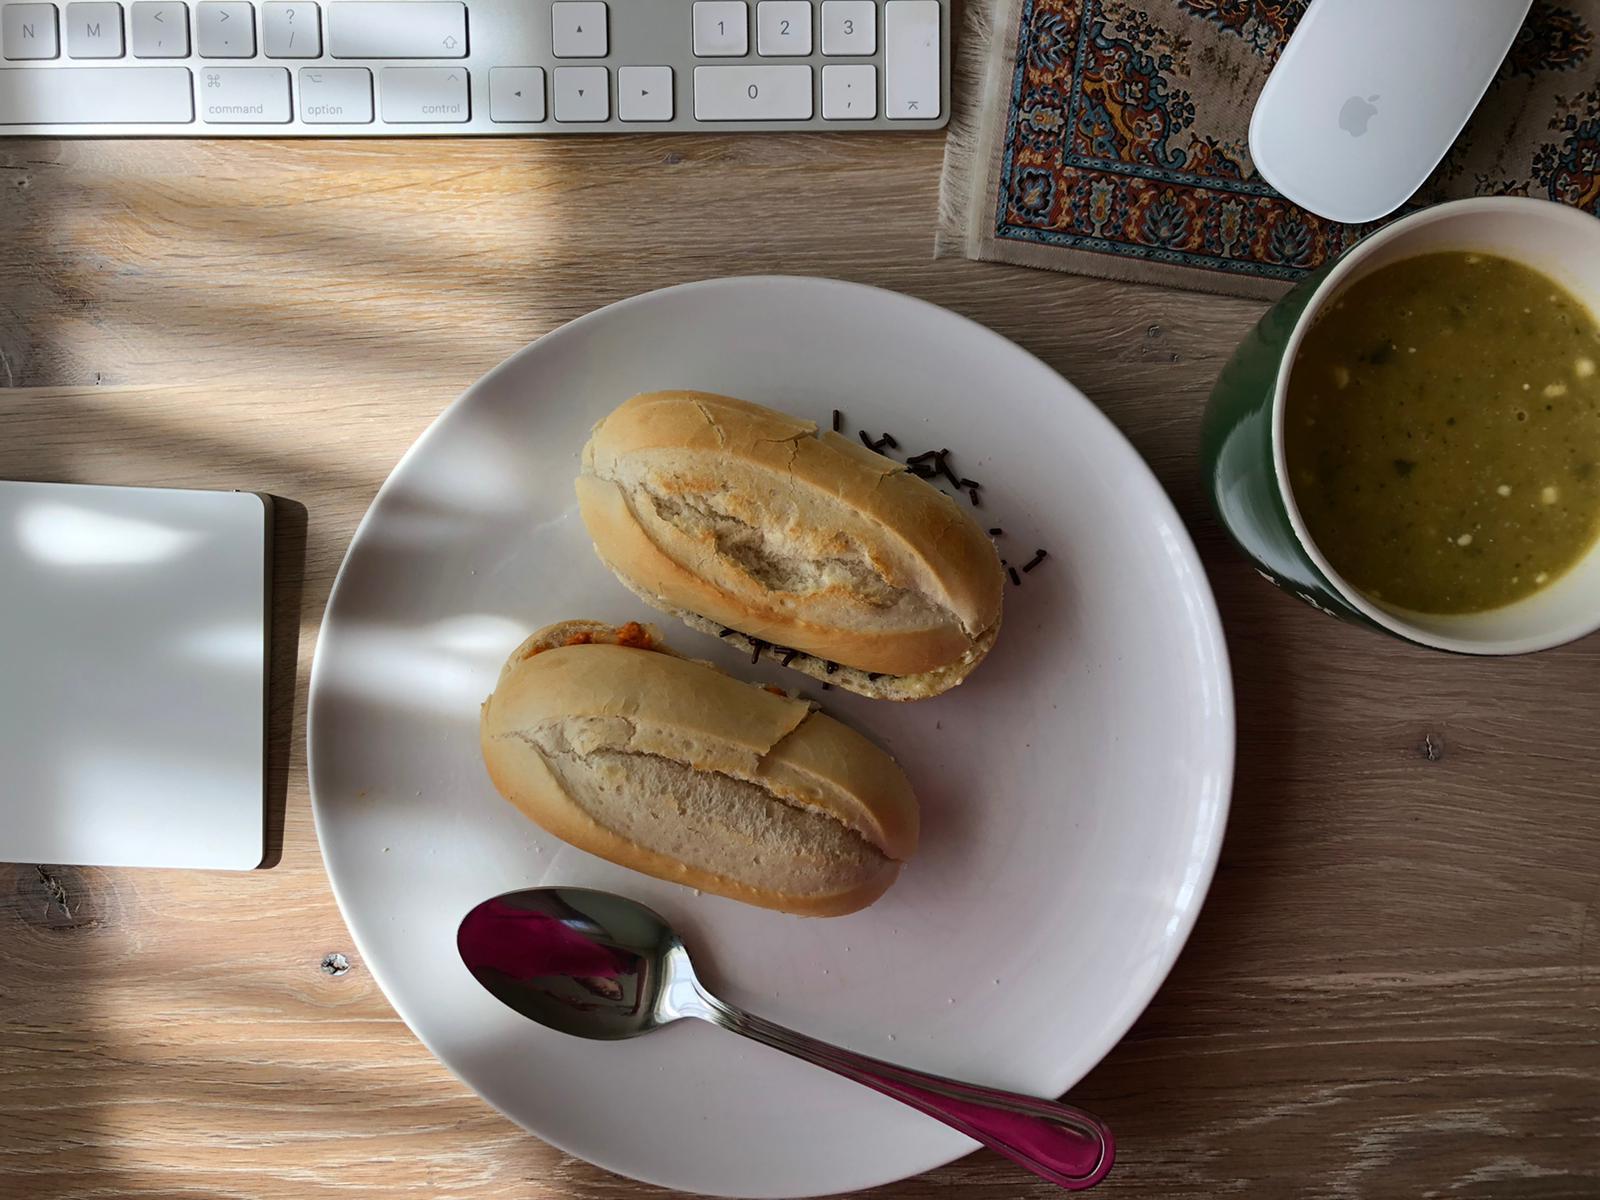 Lunch wel even achter de iMac